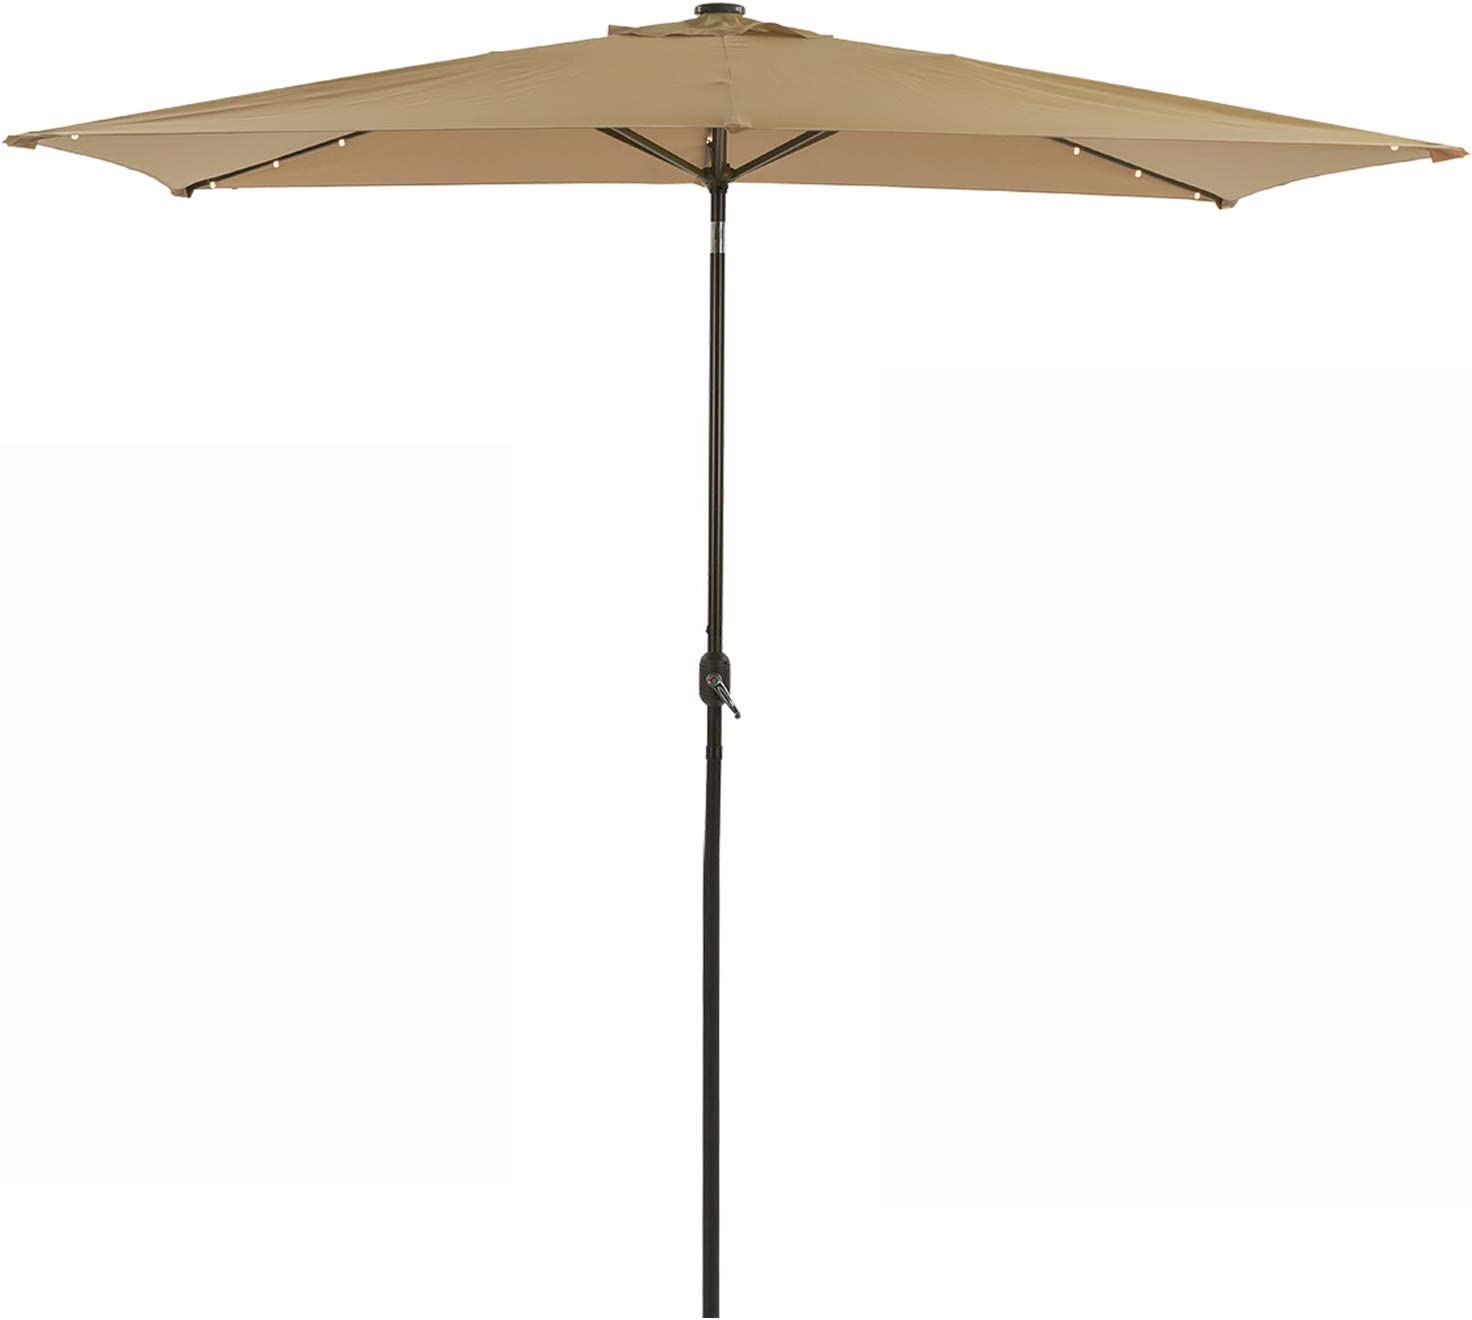 MISSBRELLA 10 x 6.5ft Solar Patio Umbrella 26 LED Lighted Market Table Steel Rectangular Umbrella with Push buntton Tilt and Crank, 6 Ribs for Garden Deck Backyard Pool, Beige